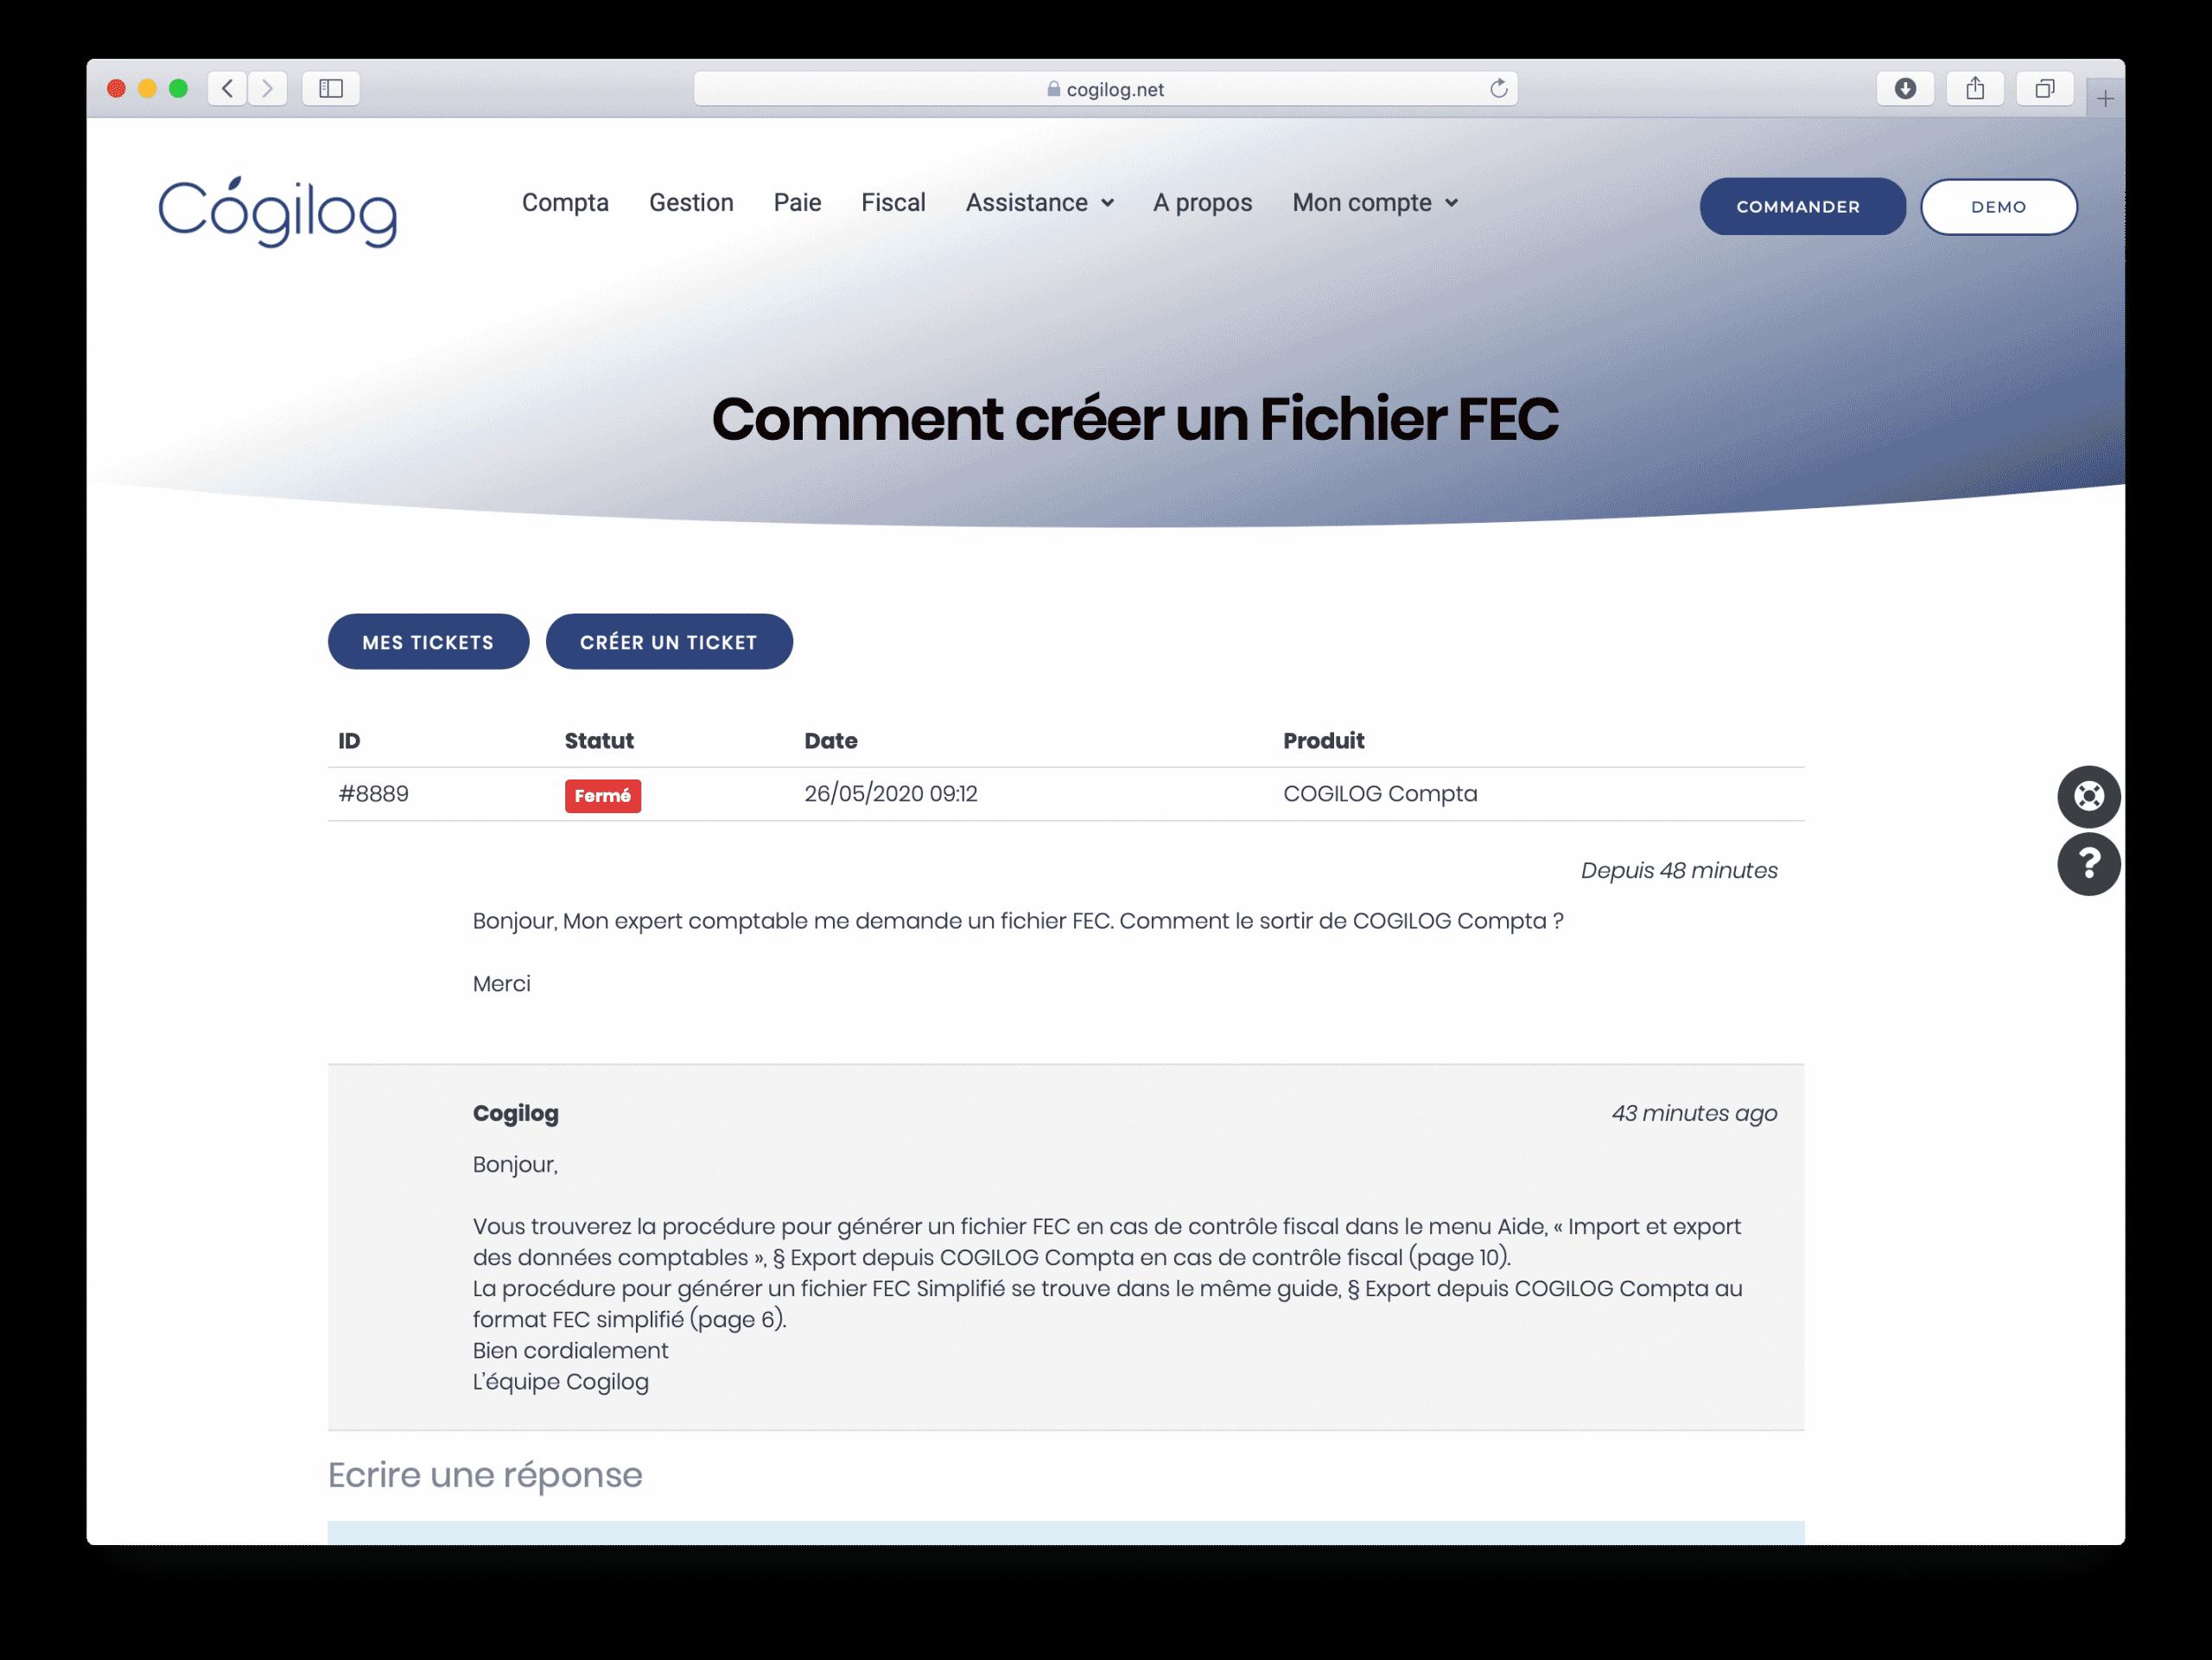 Support Ticket - 6 - Consultation de l'historique des tickets